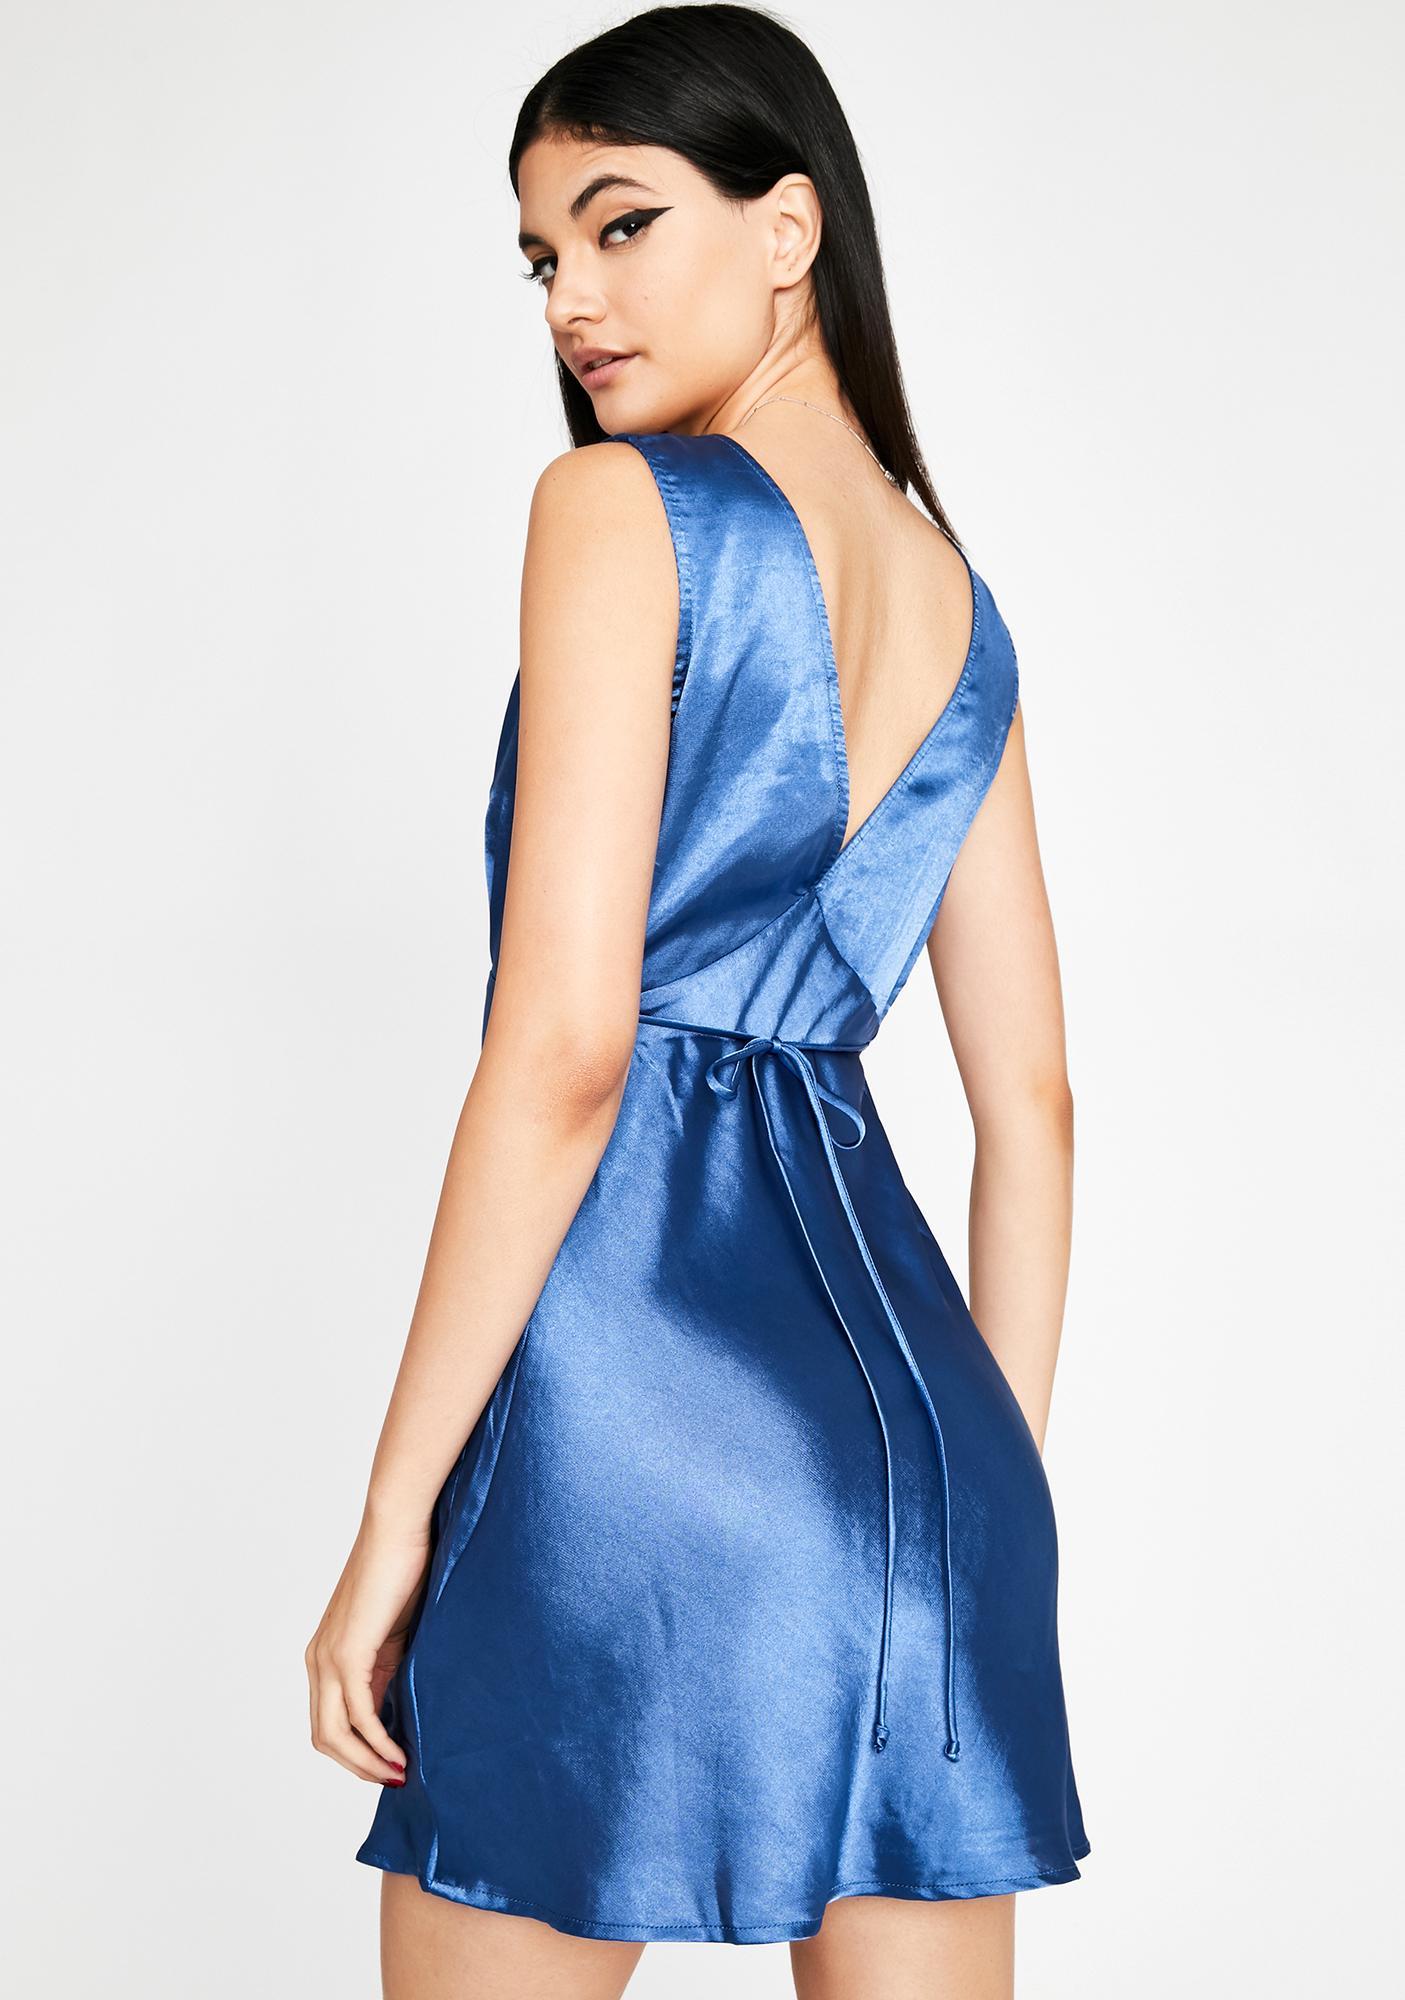 Azure Feelin' Dreamy Satin Dress